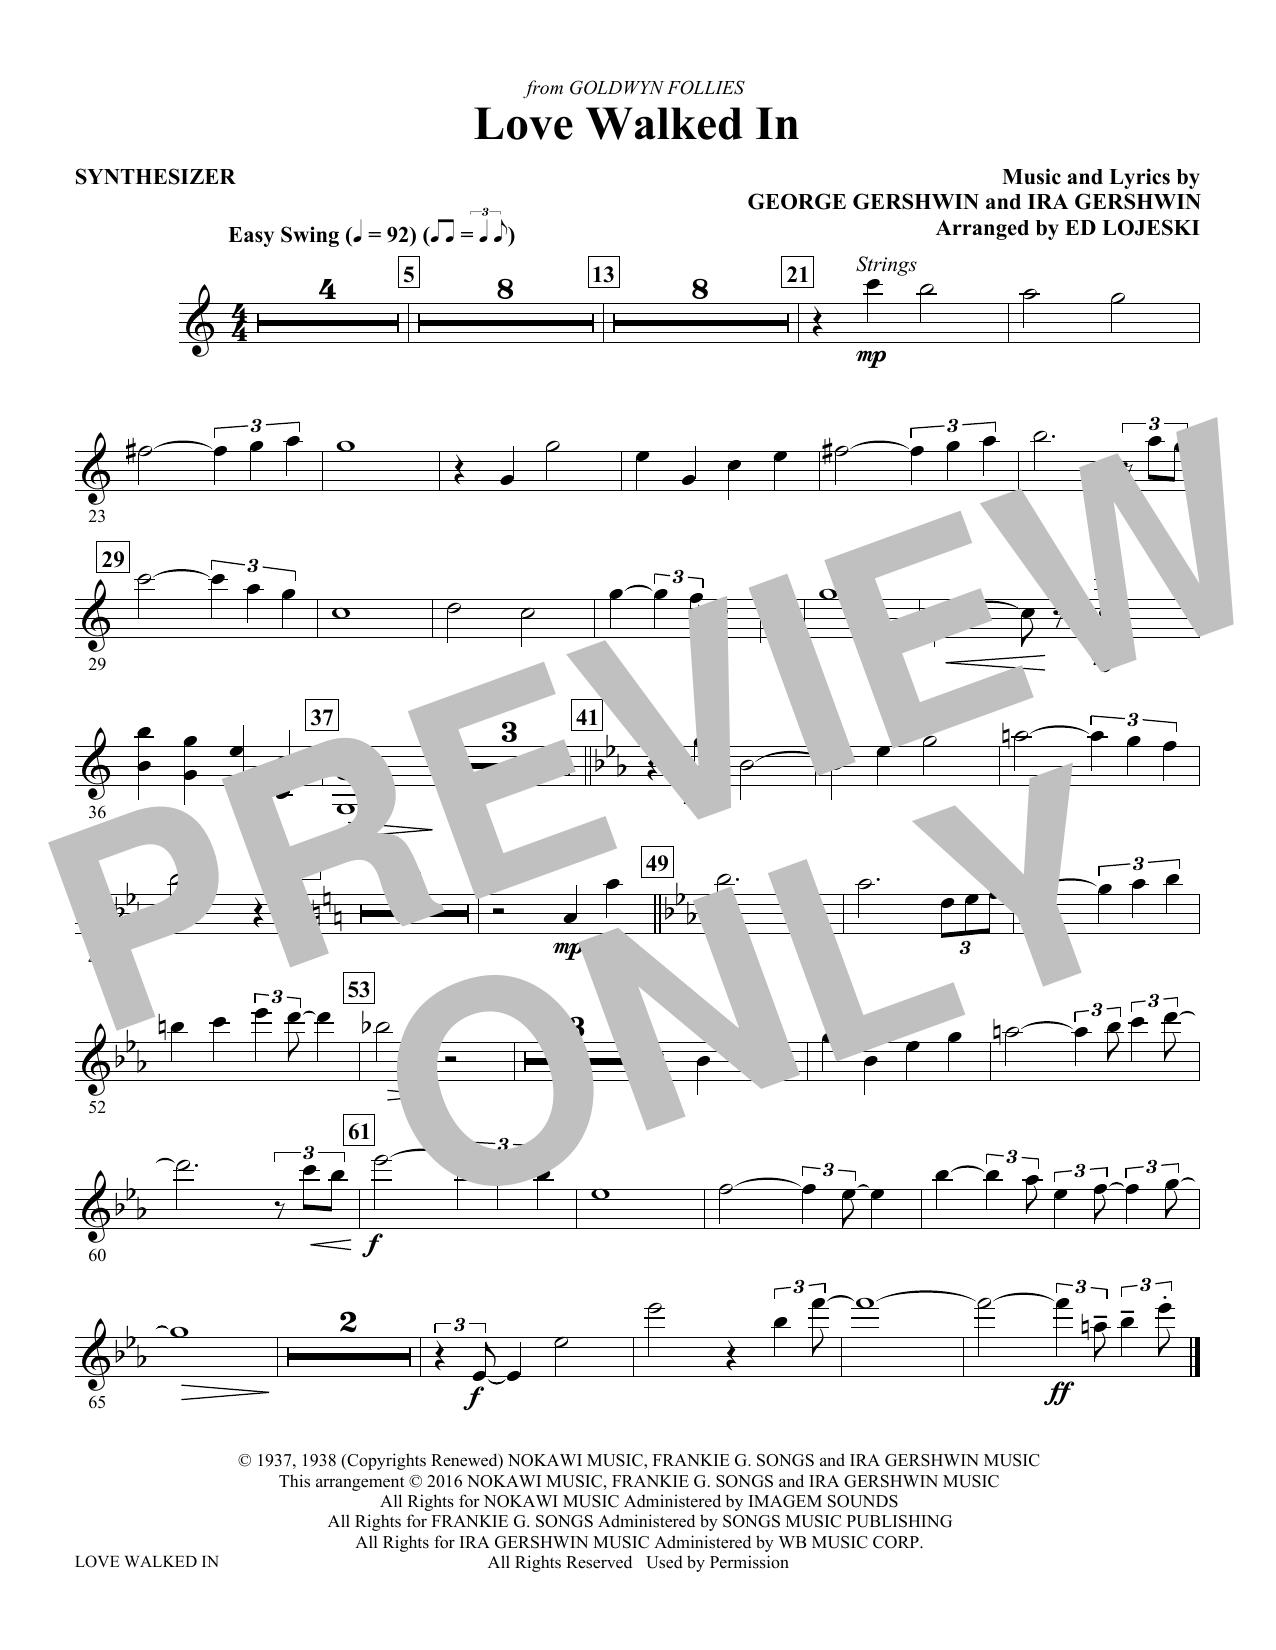 Ira Gershwin - Love Walked In - Synthesizer